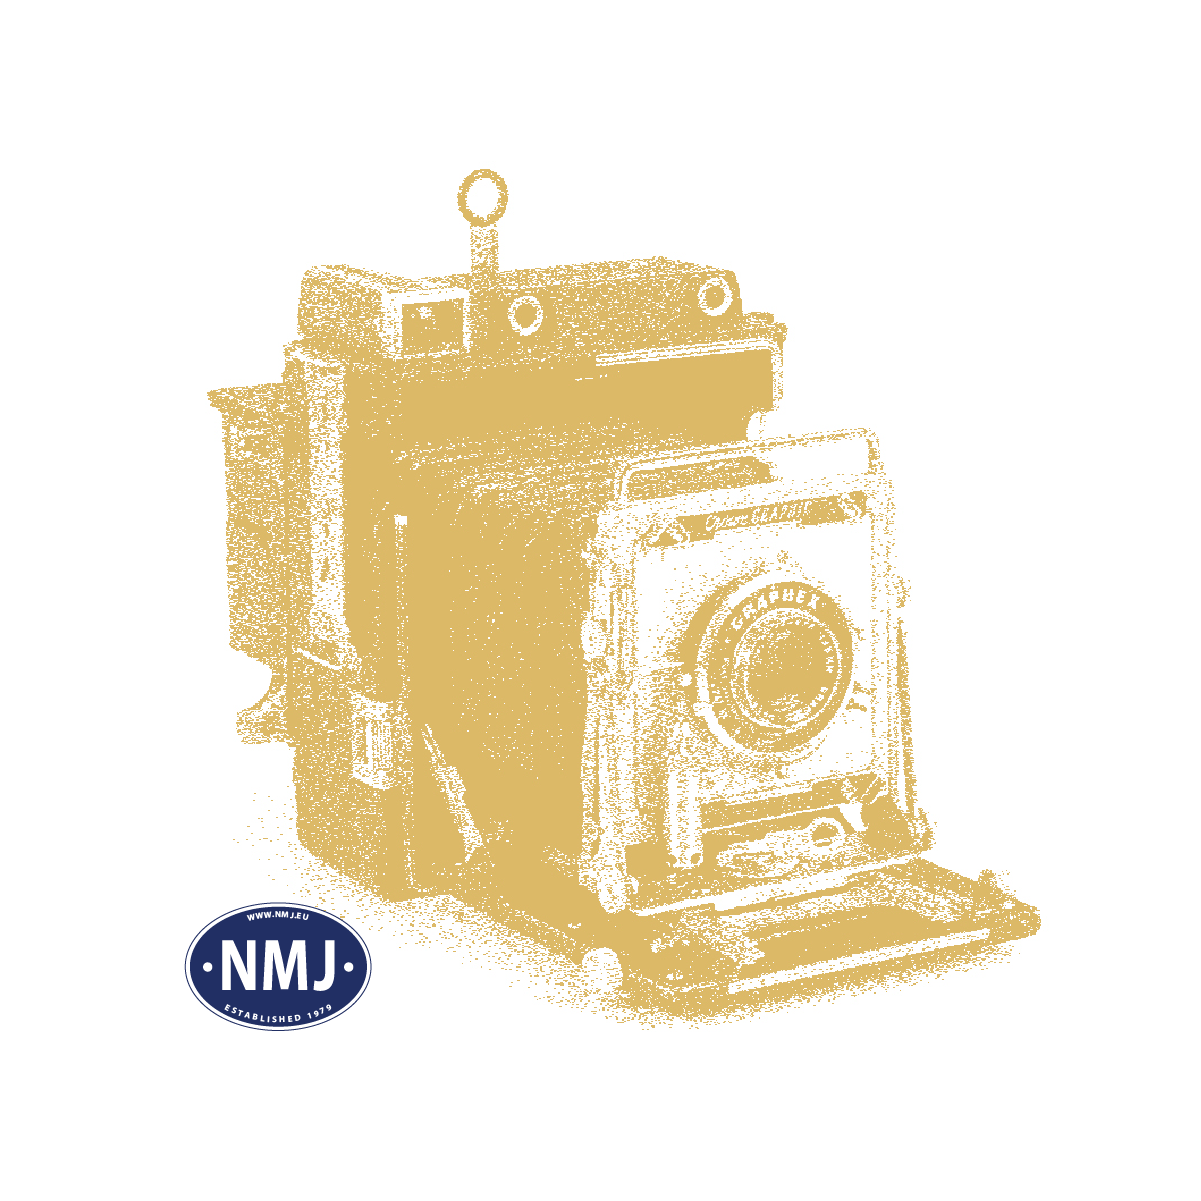 NJK40 - Norsk Jernbaneklubb 40 år, Jubileumsbok